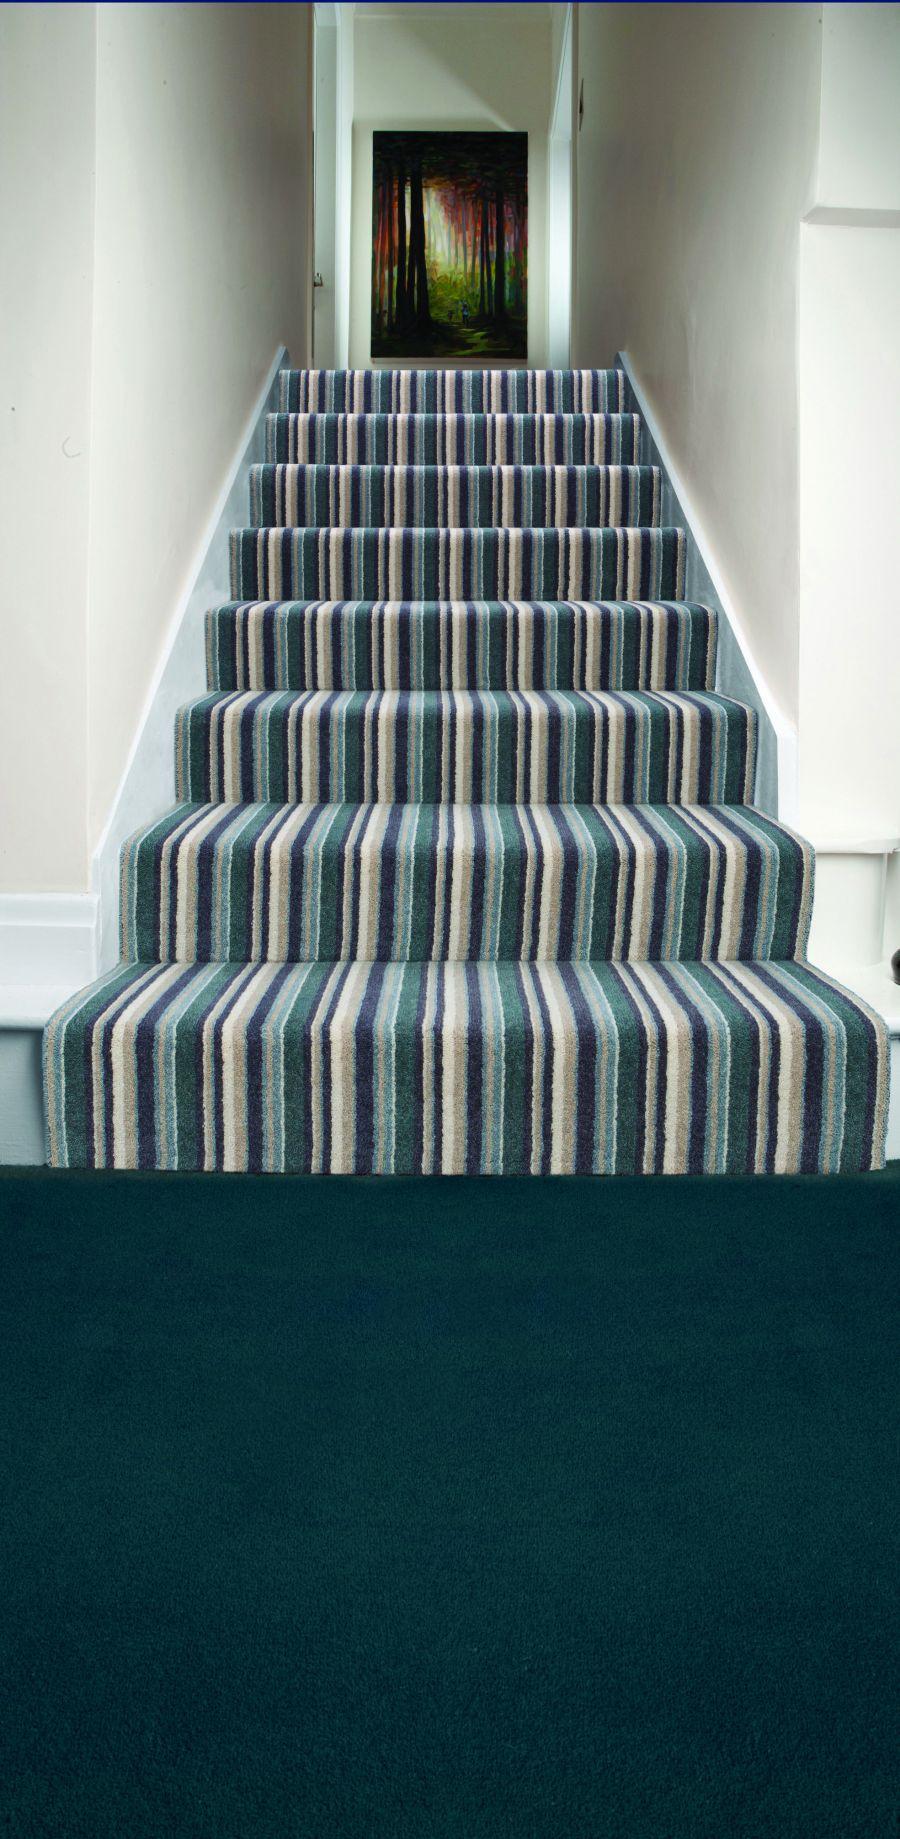 Artwork Se Carpets For Sale Ramsdens Home Interiors